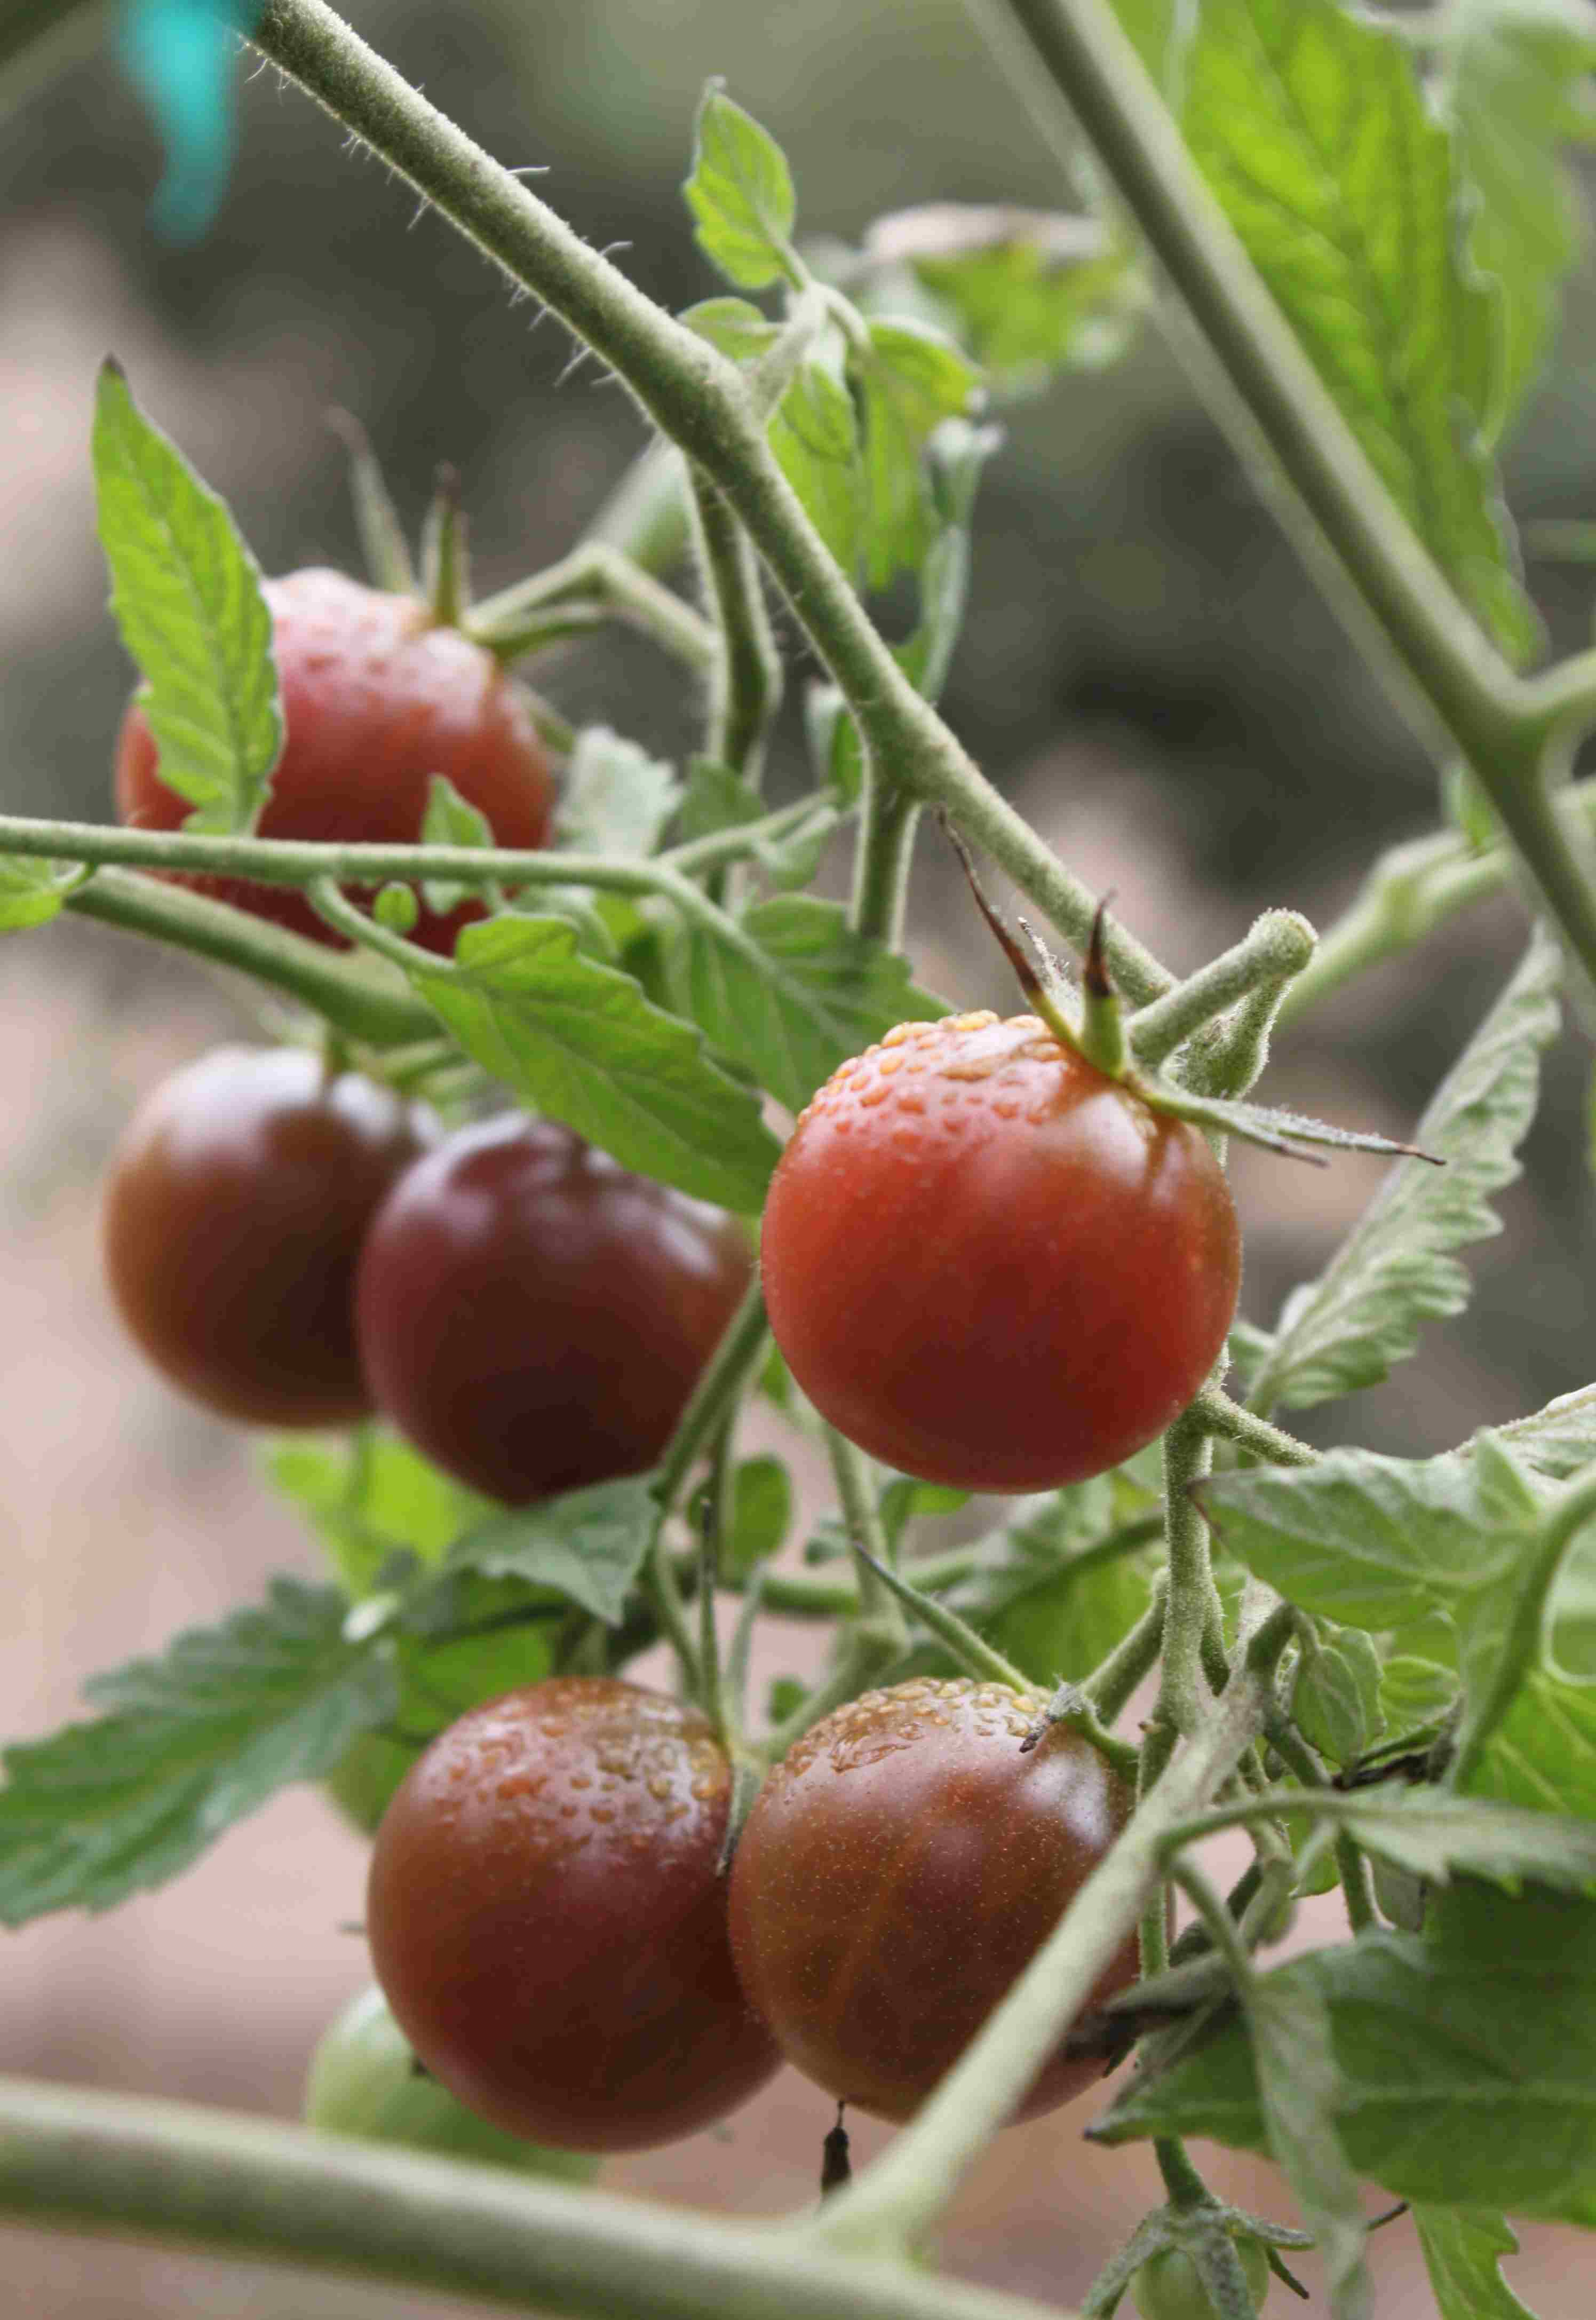 wet juicy tomato inspired bites kendall jackson s heirloom. Black Bedroom Furniture Sets. Home Design Ideas